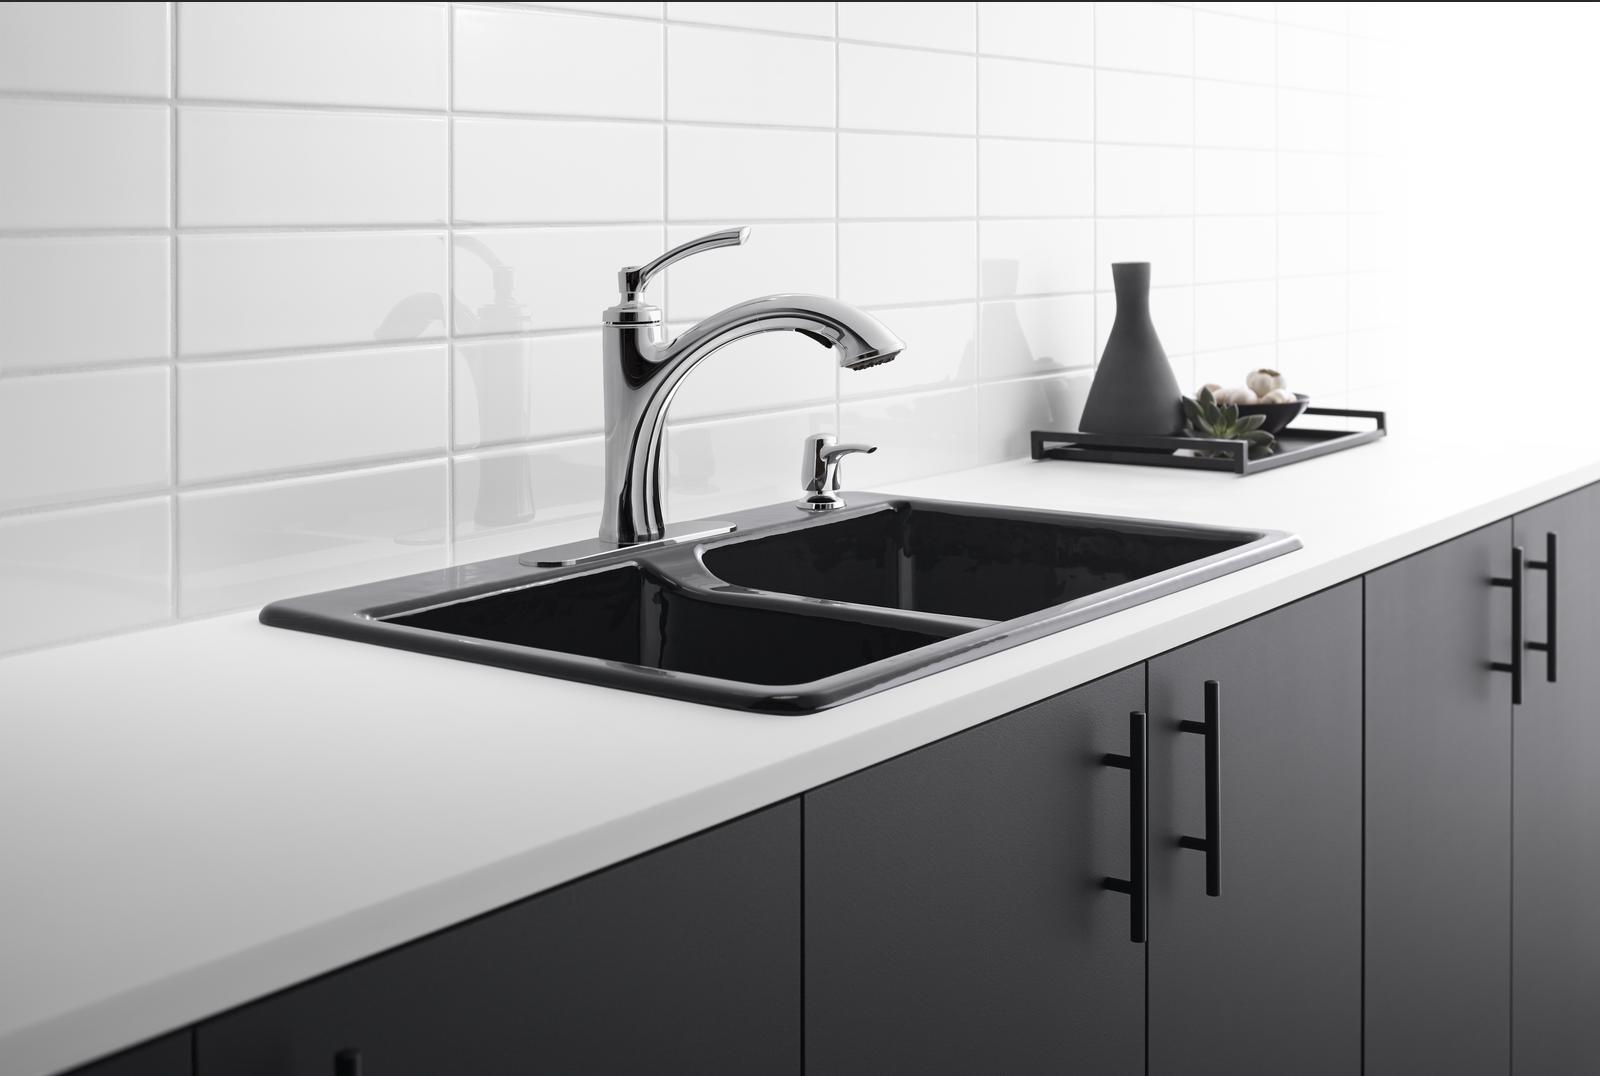 Take Back Your Kitchen: Choosing A New Kitchen Faucet - Casa Watkins ...